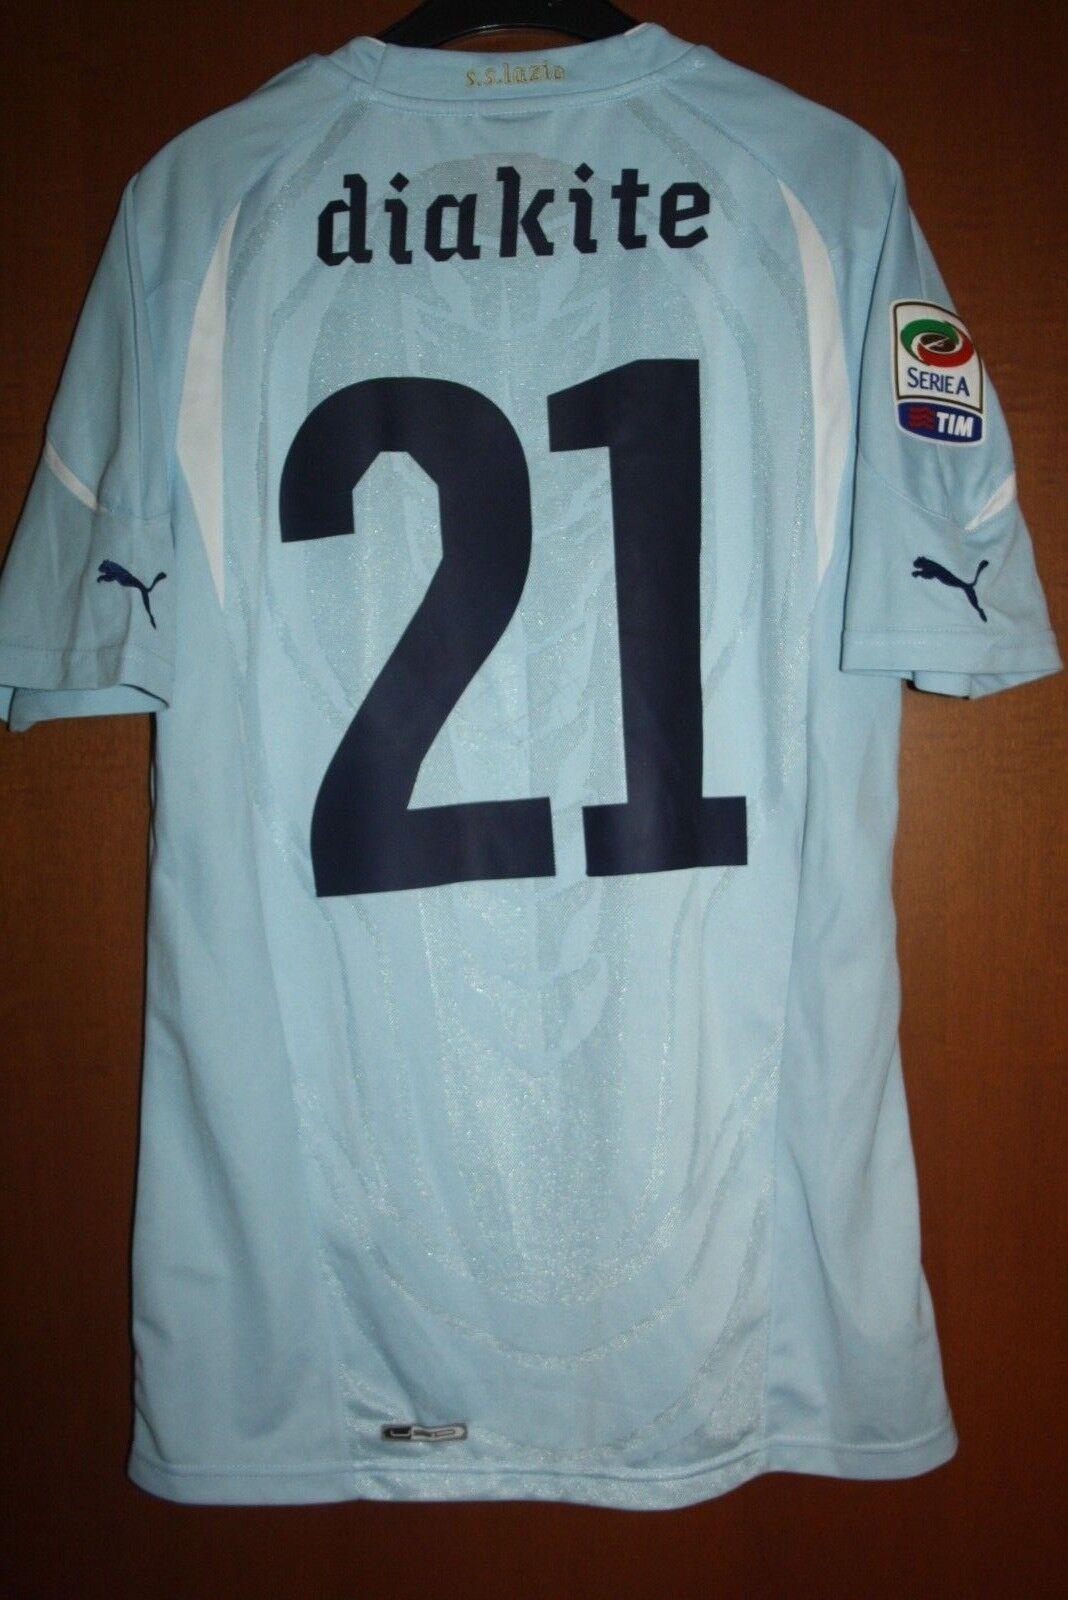 Maglia Shirt Trikot Maillot Jersey Camiseta SS Lazio Diakite Patch Serie A Toppa